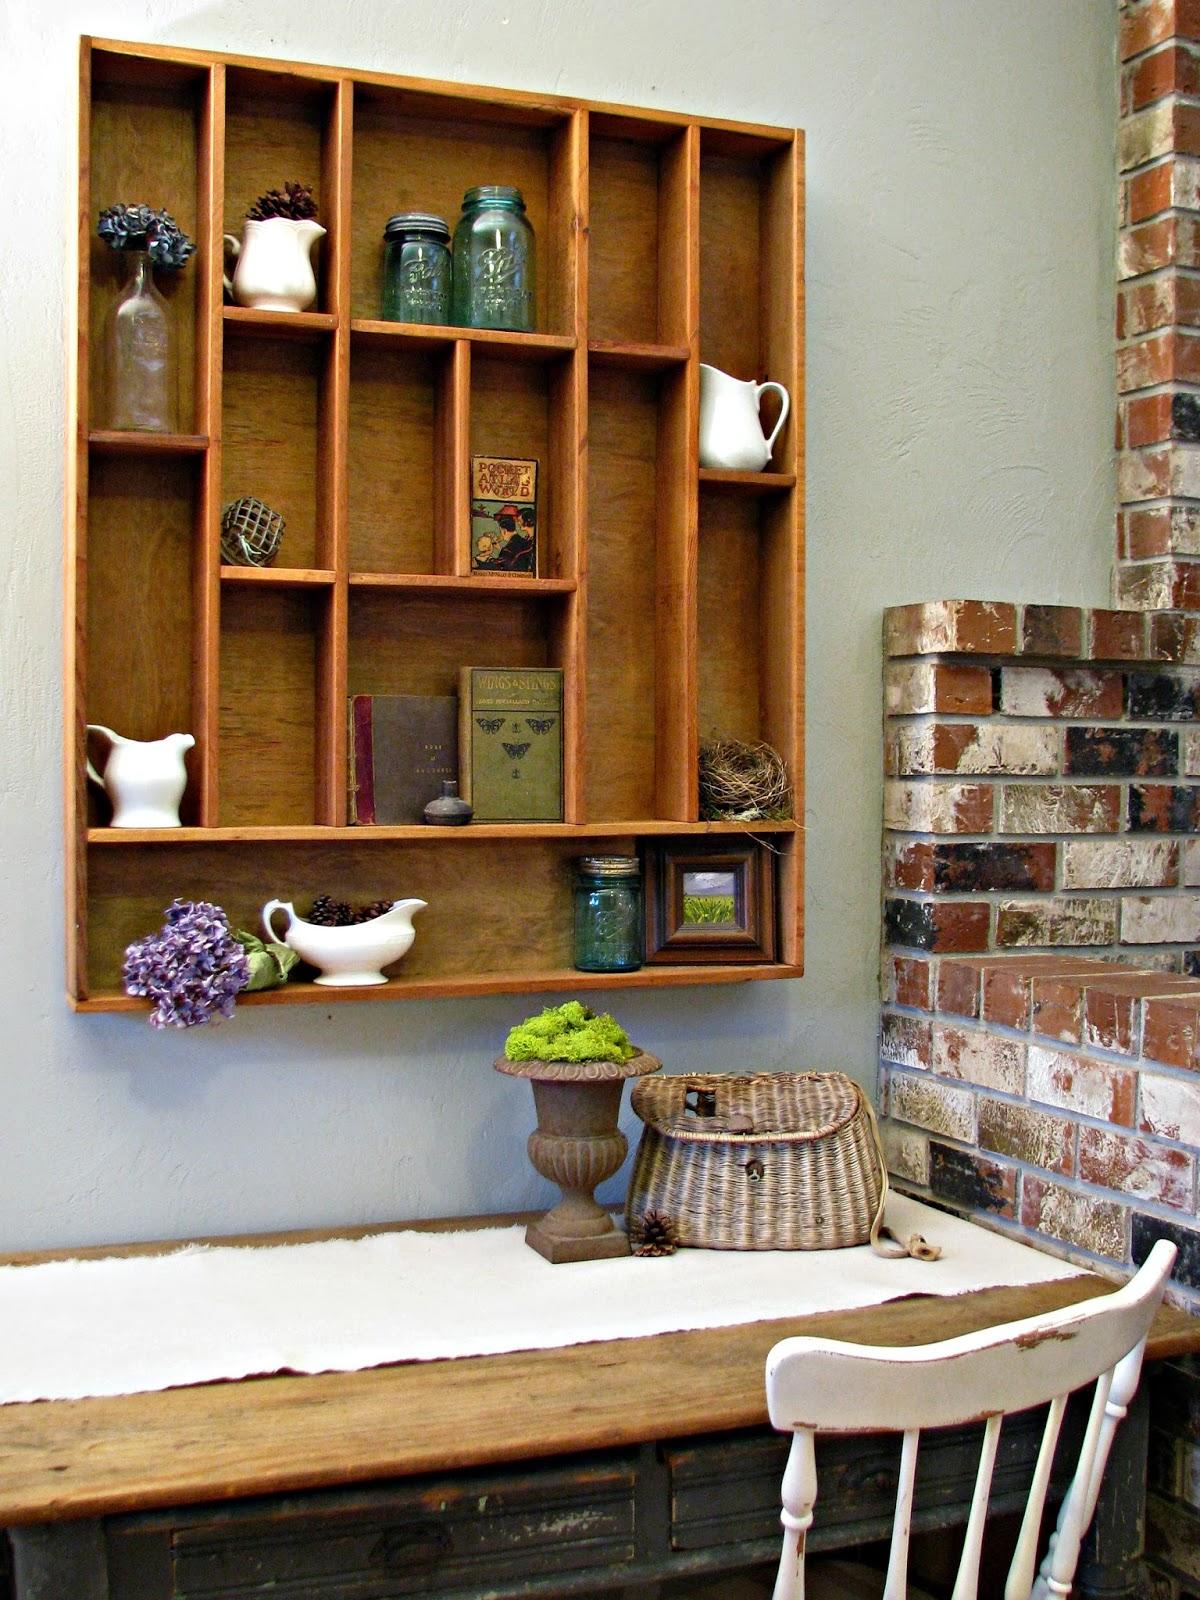 Blue Roof Cabin Diy Letterpress Tray Display Shelf Tutorial